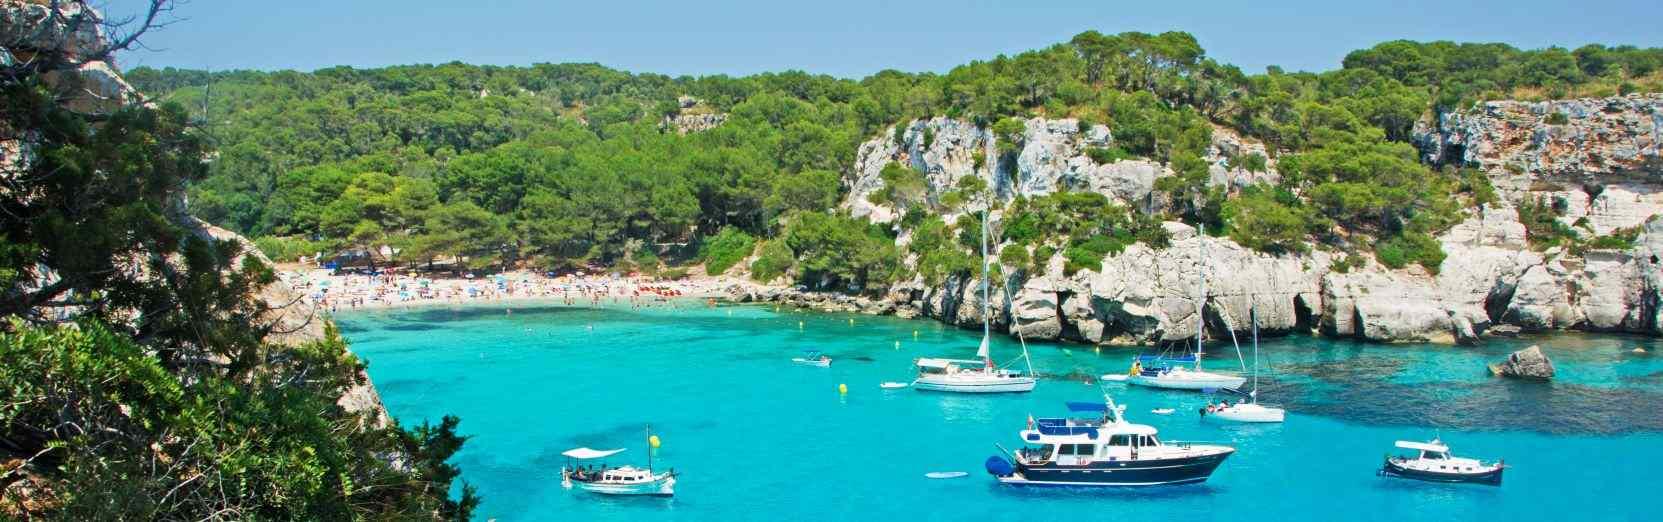 Menorca Reise